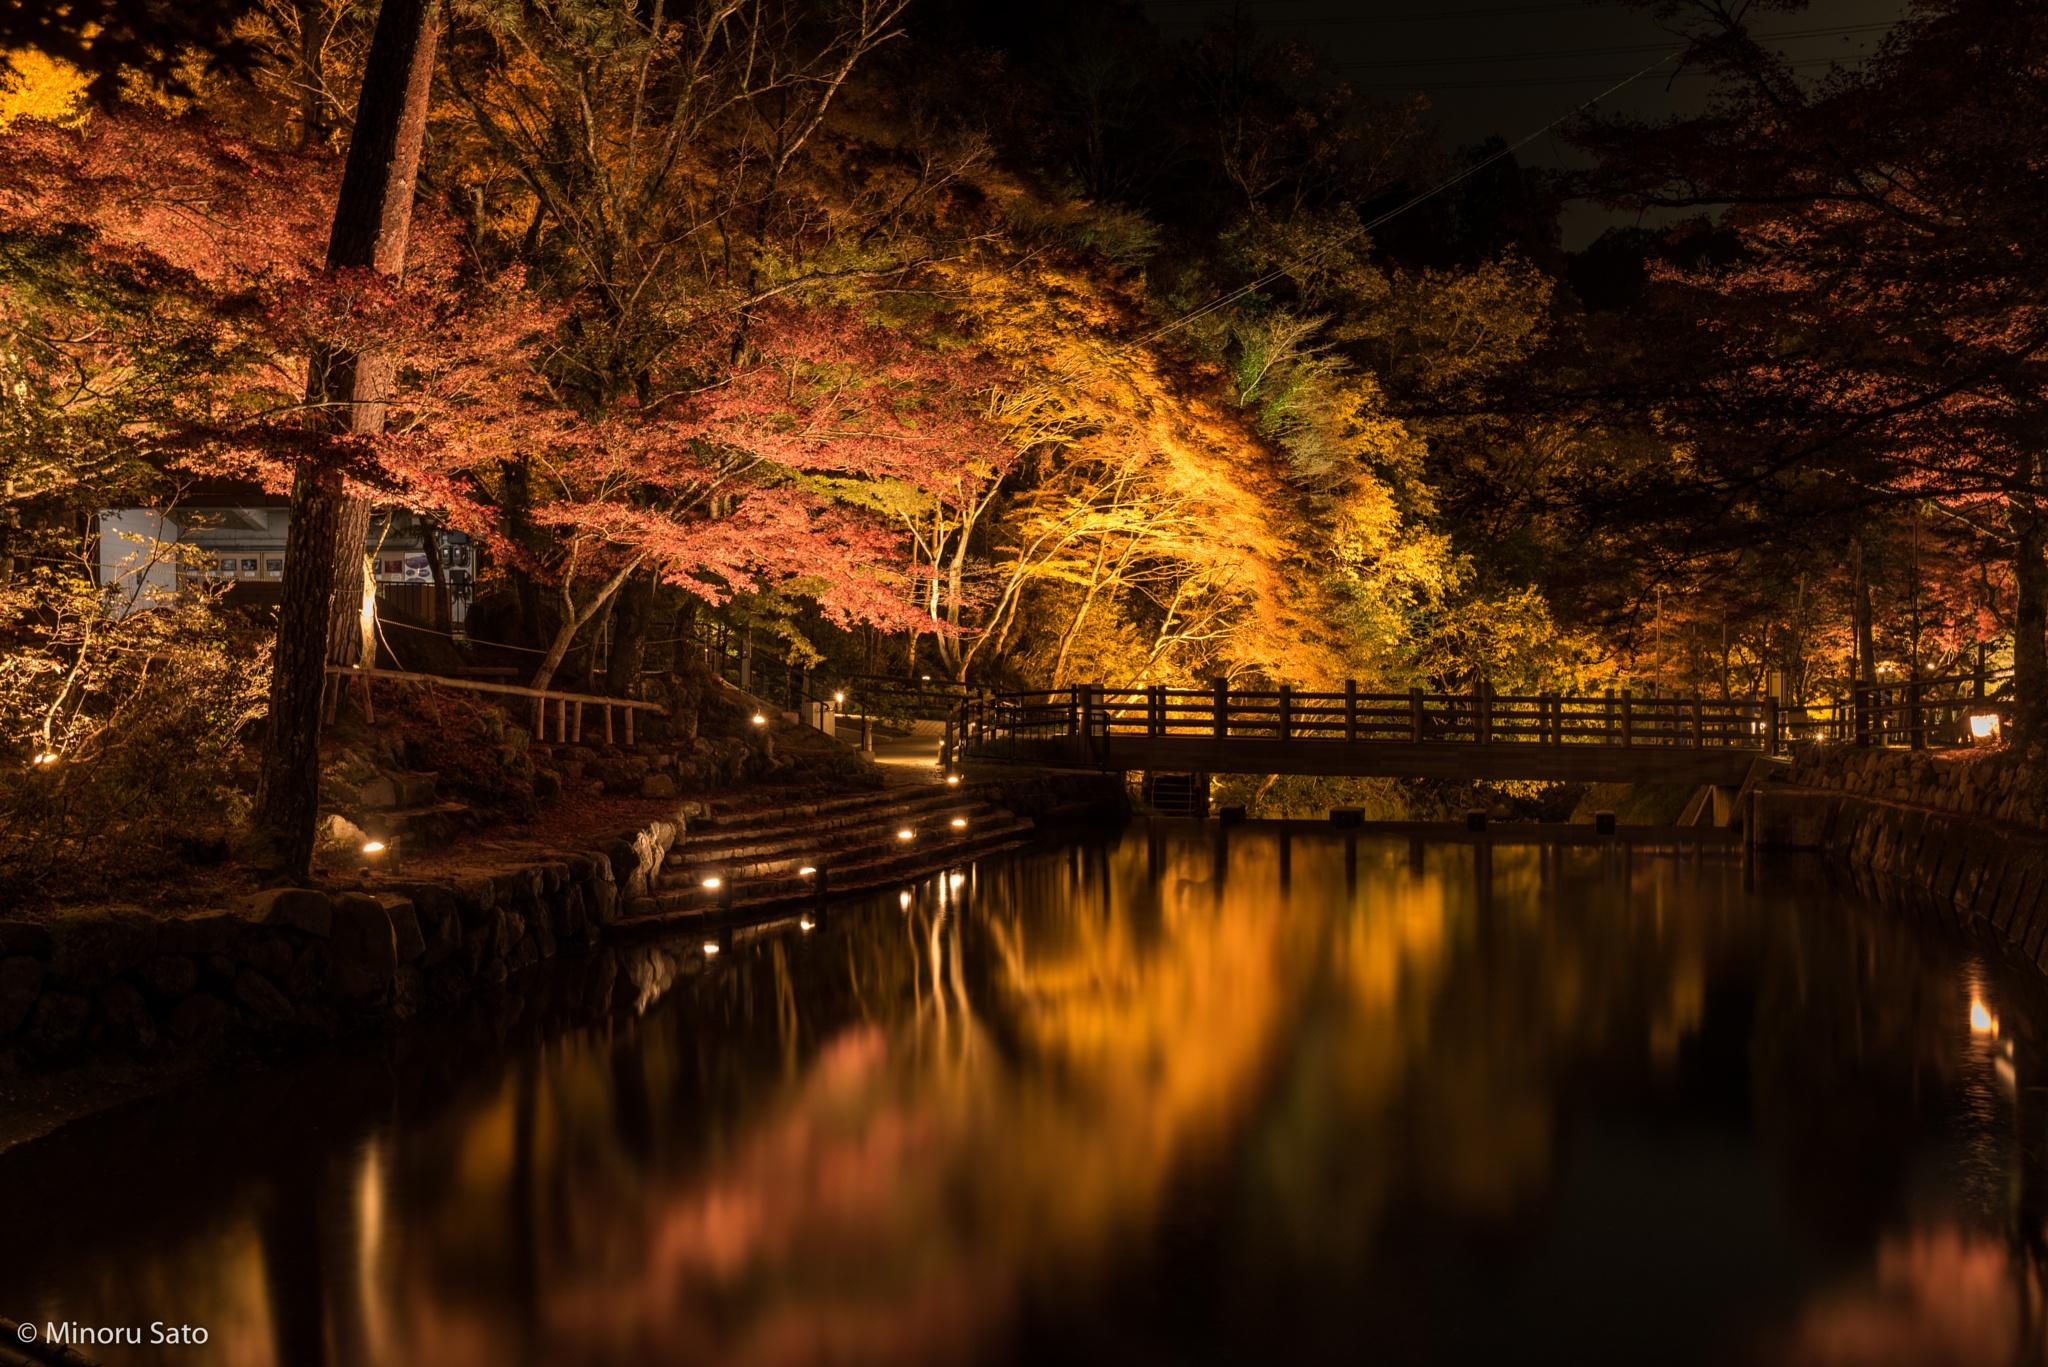 Iwayado Park Autumn LightUp - Seto city, Aichi by Minoru Sato